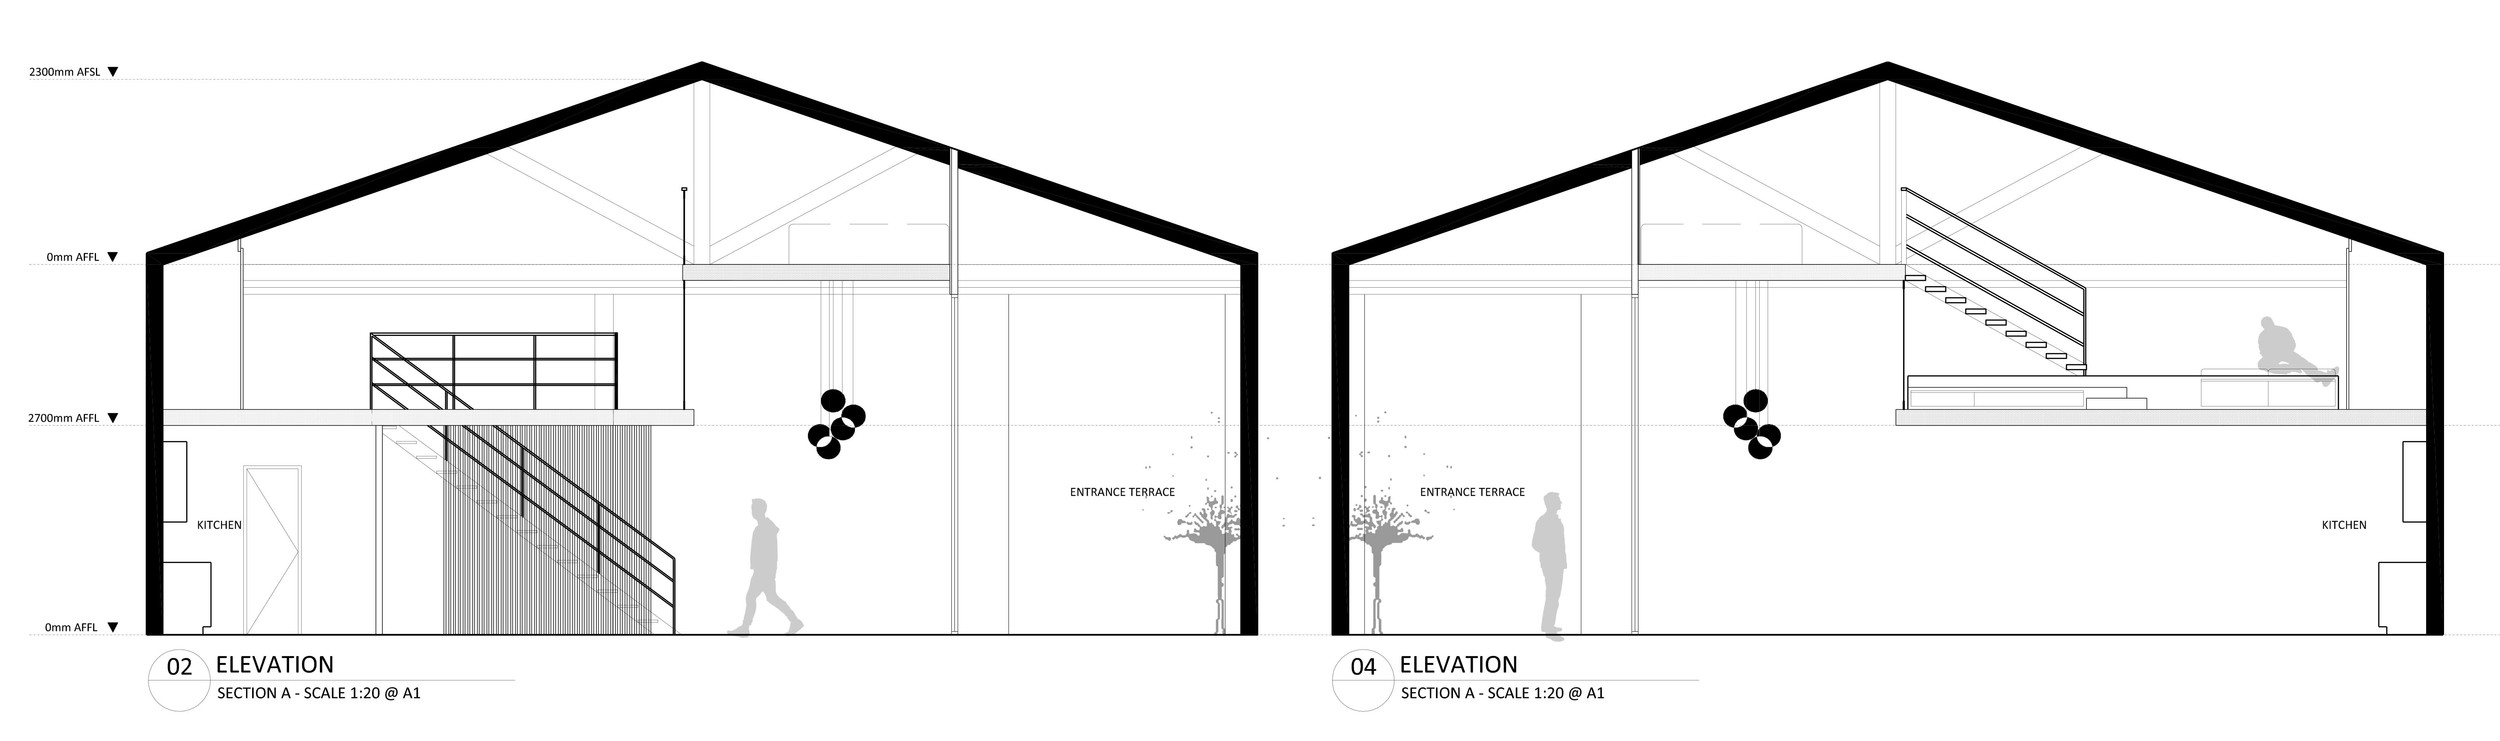 LONG ELEVATION.jpeg